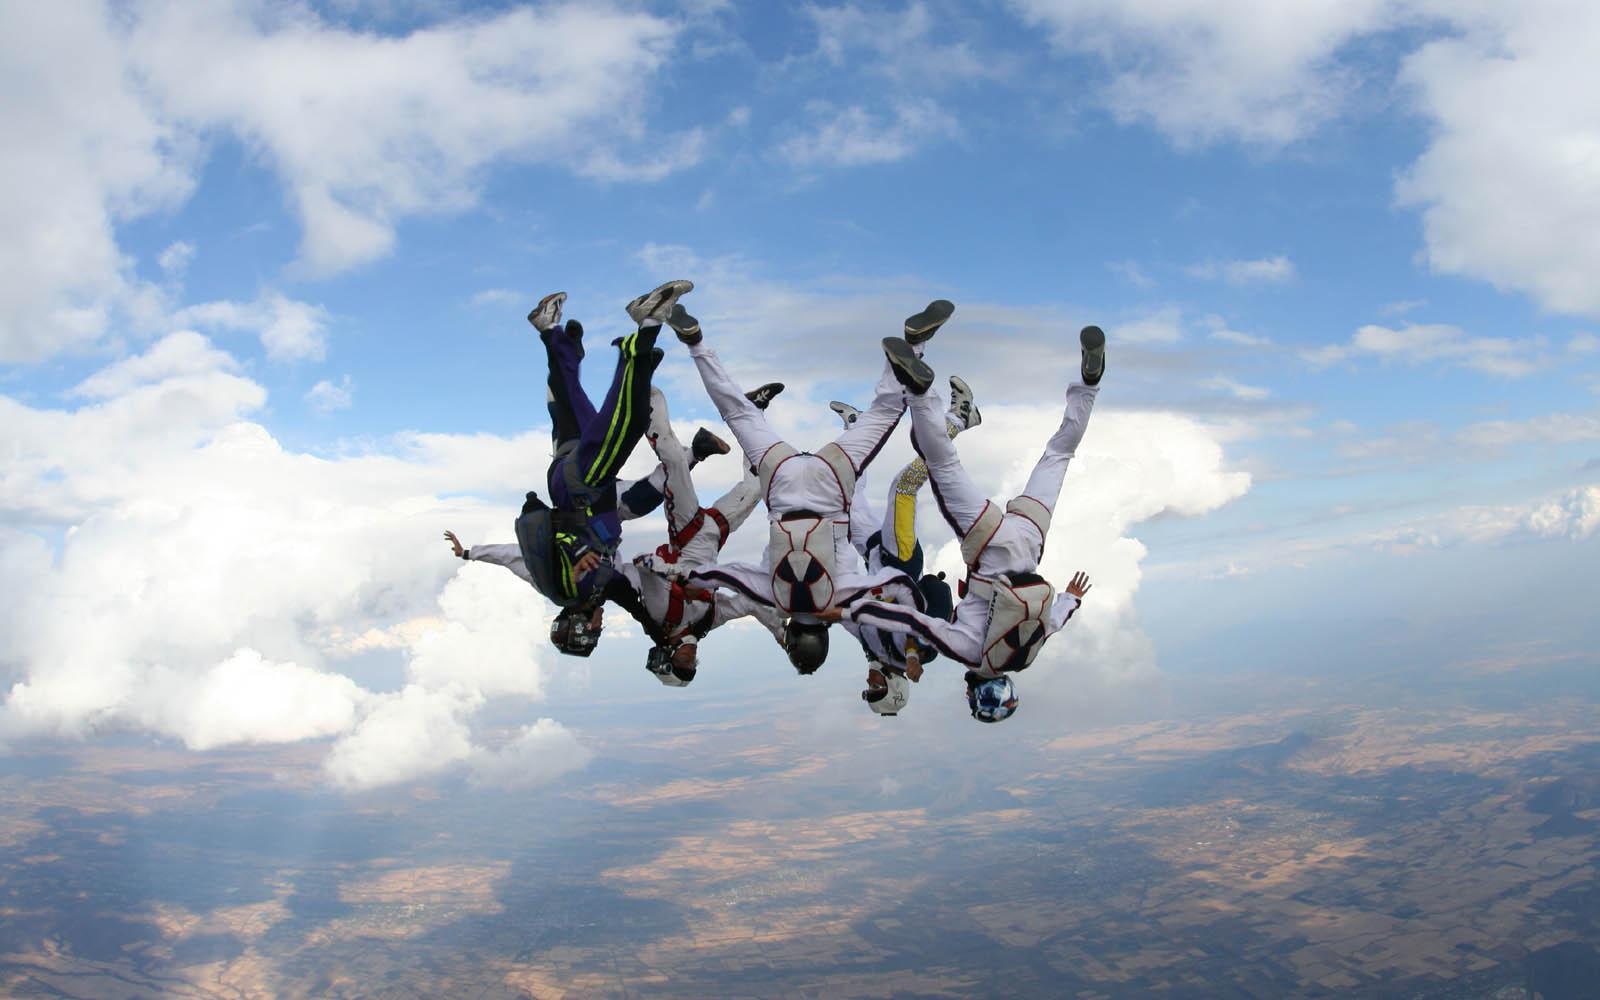 Skydiving parachute hd